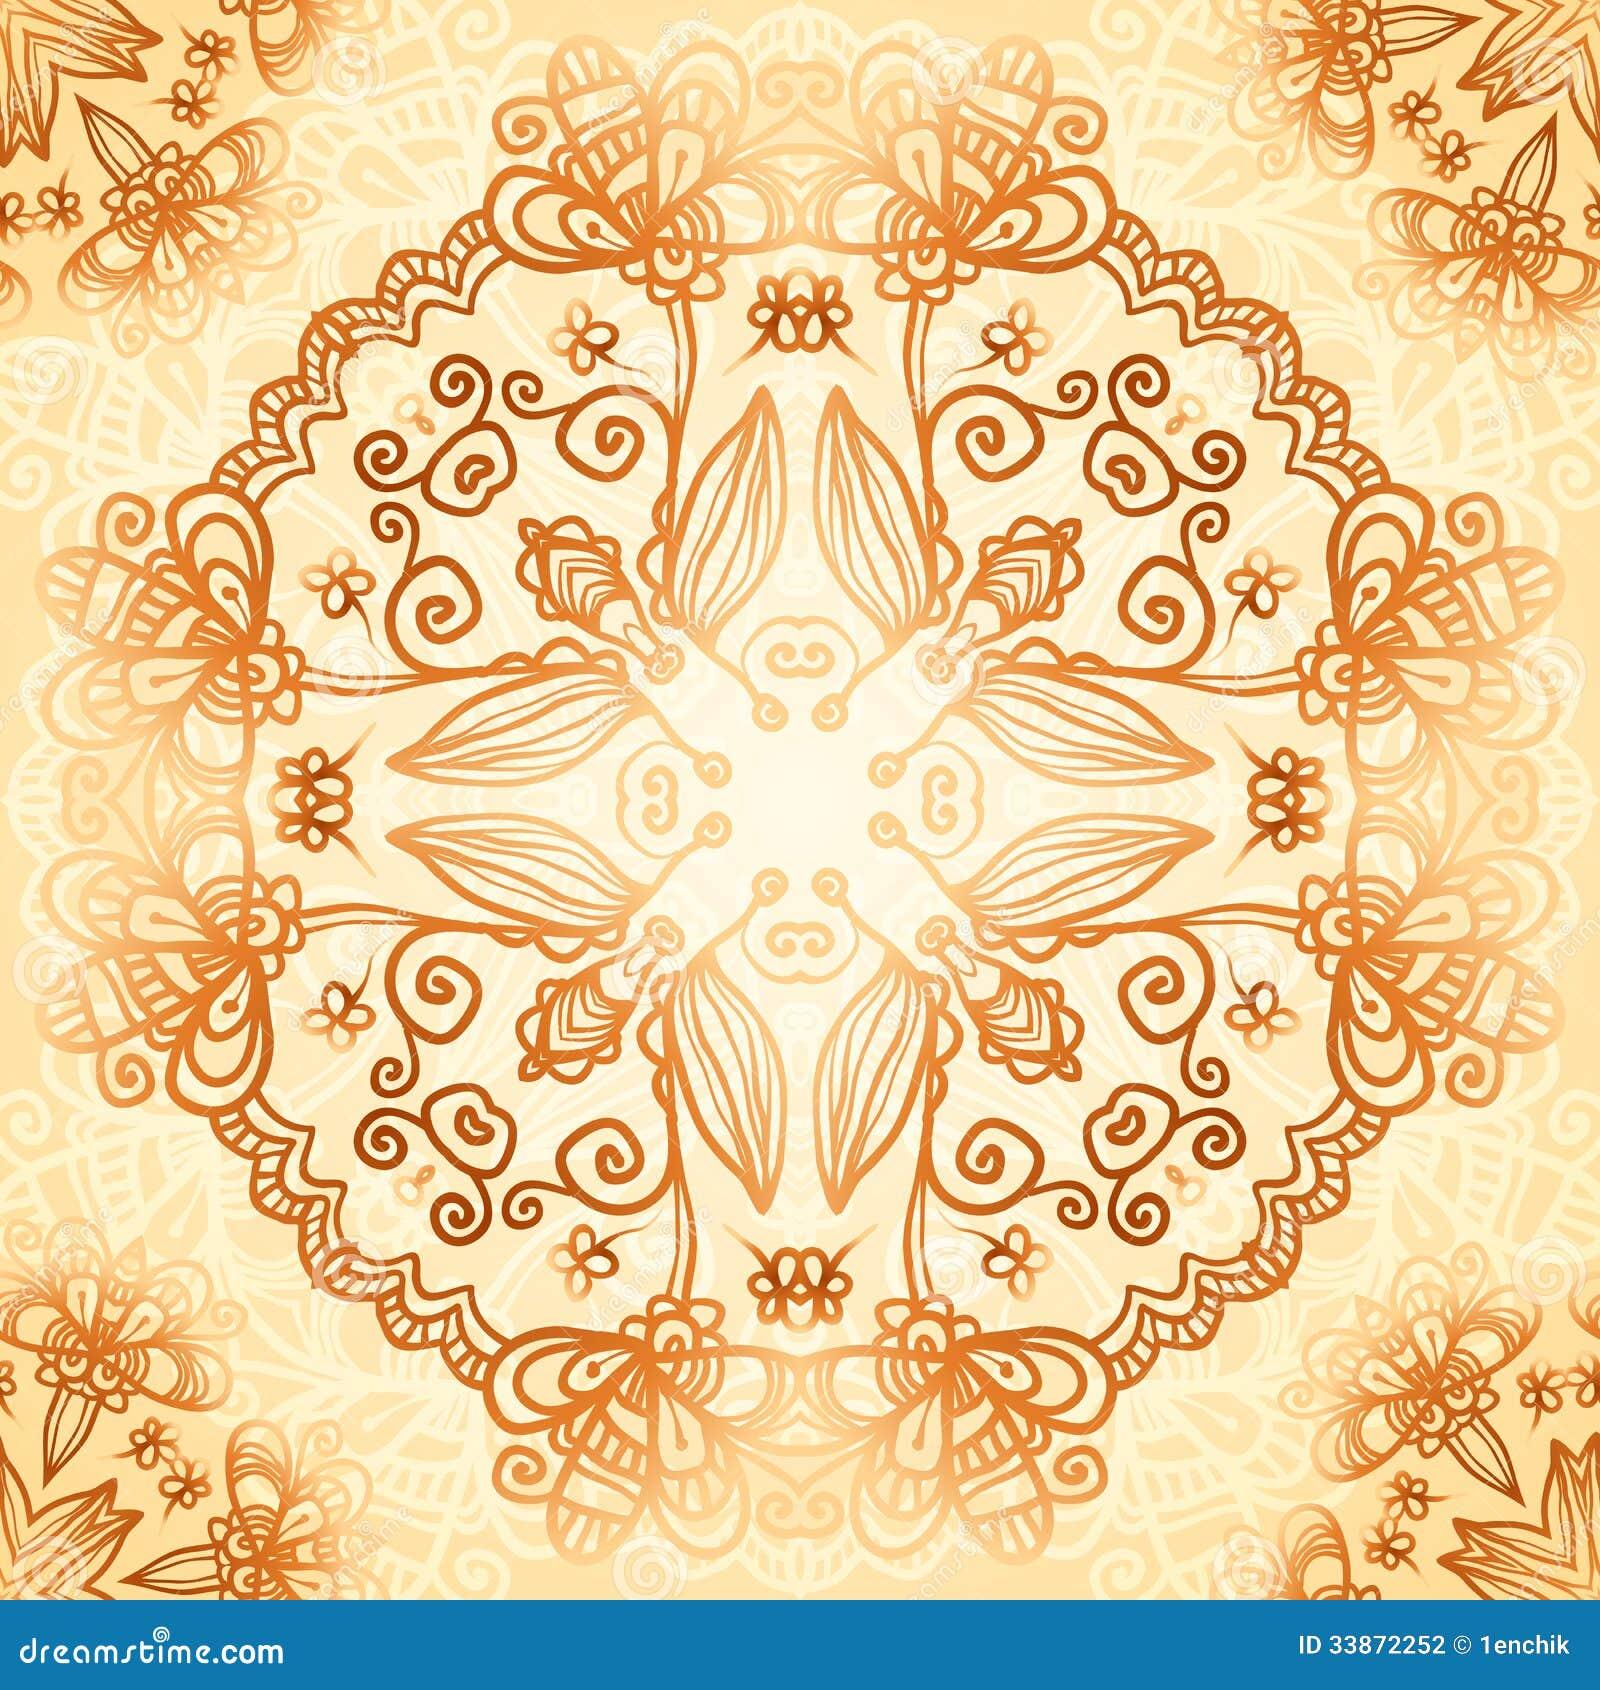 Ornate vintage vector background in mehndi style royalty free stock - Royalty Free Stock Photo Mehndi Pattern Style Vintage